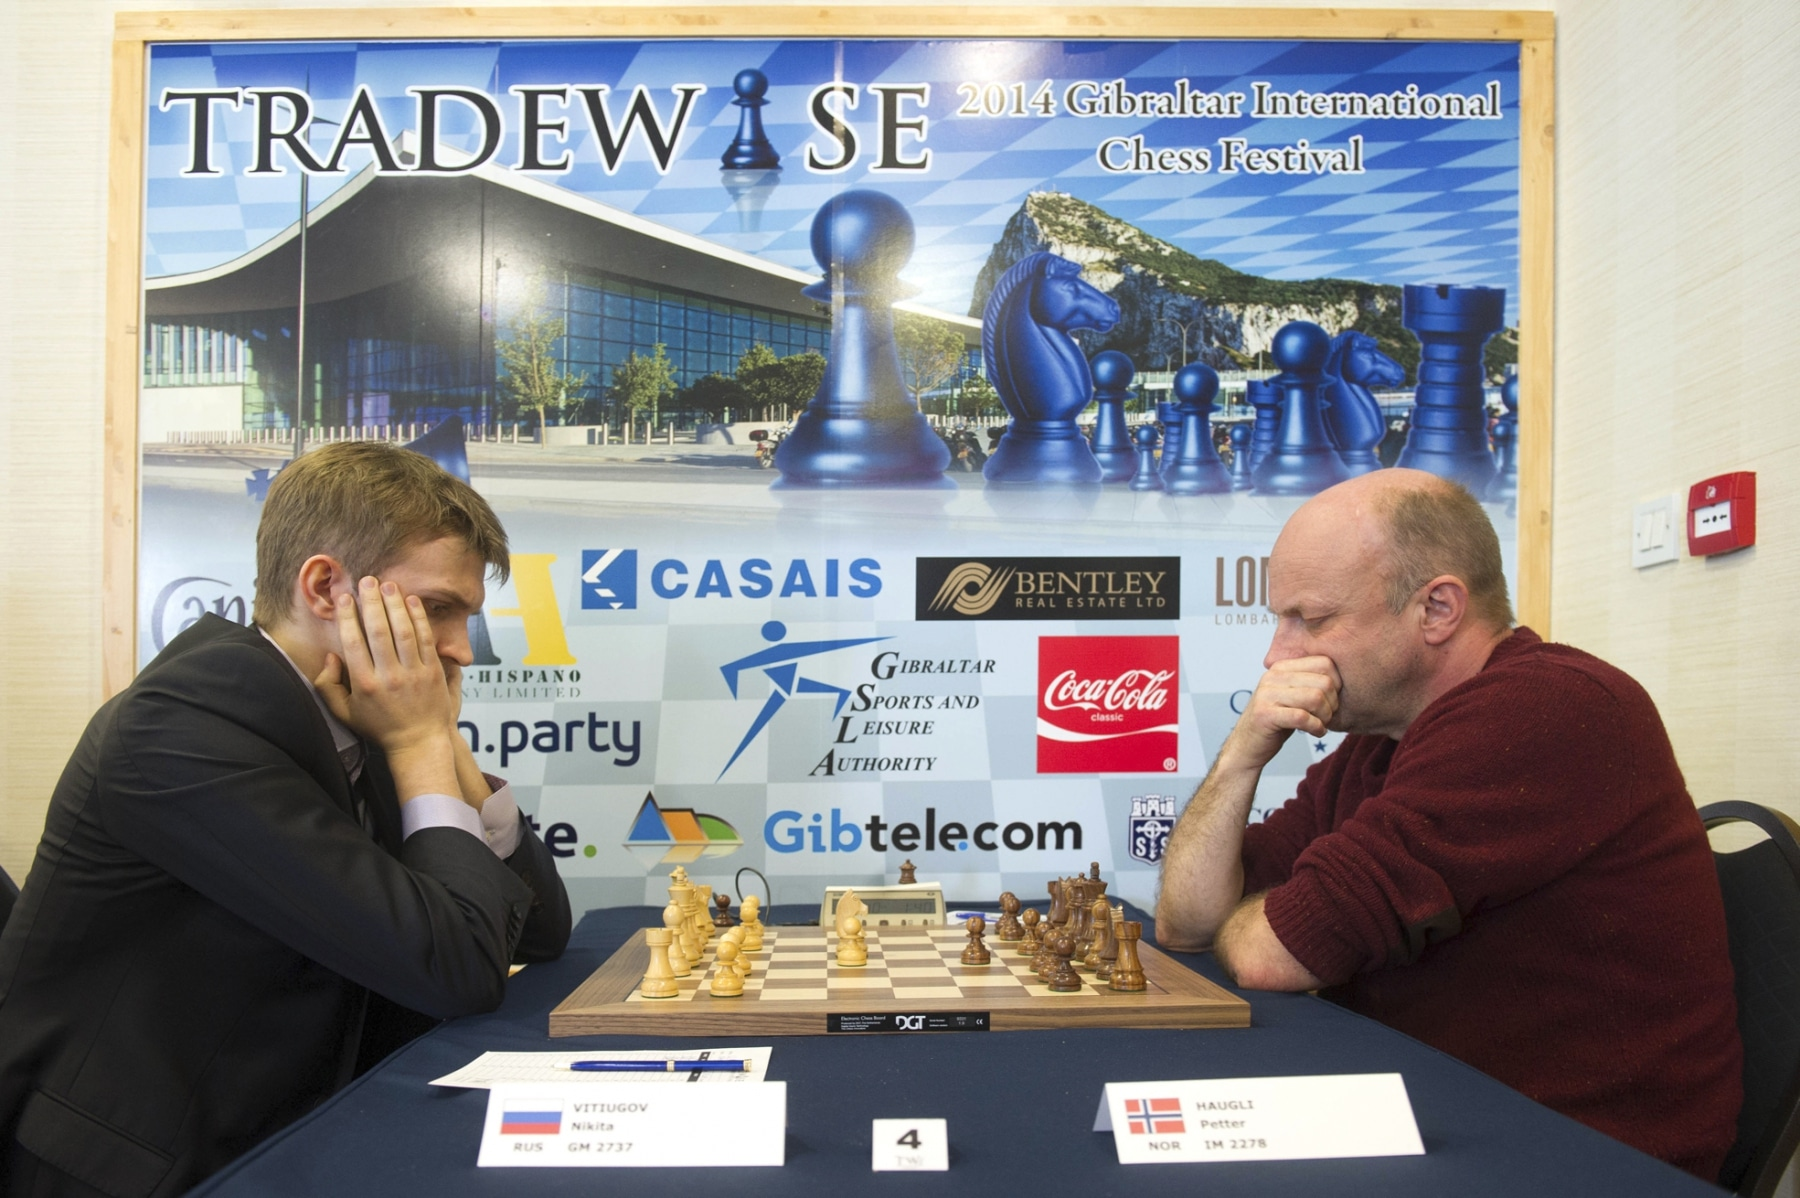 gibraltar-tradewise-chess-festival_009_12193748354_o